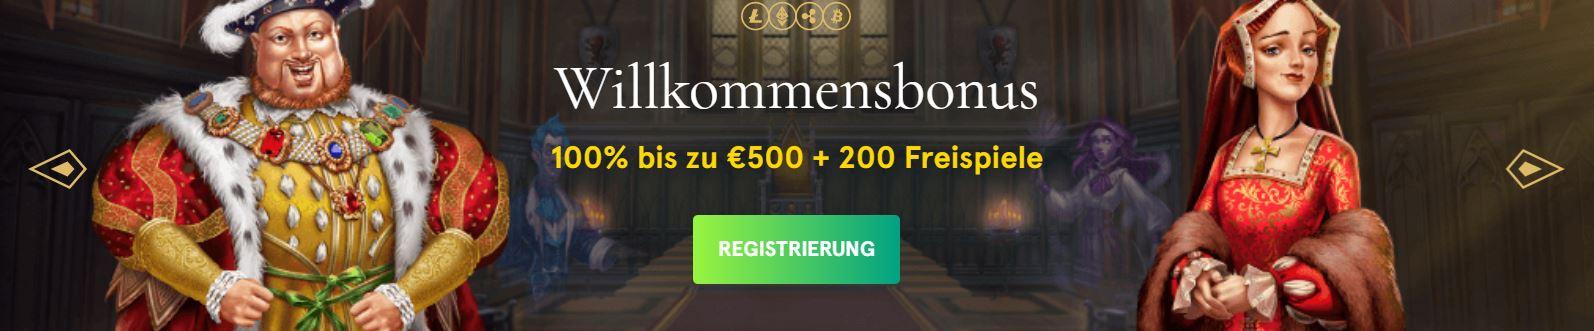 casinia 500 euro bonus und 200 free spins